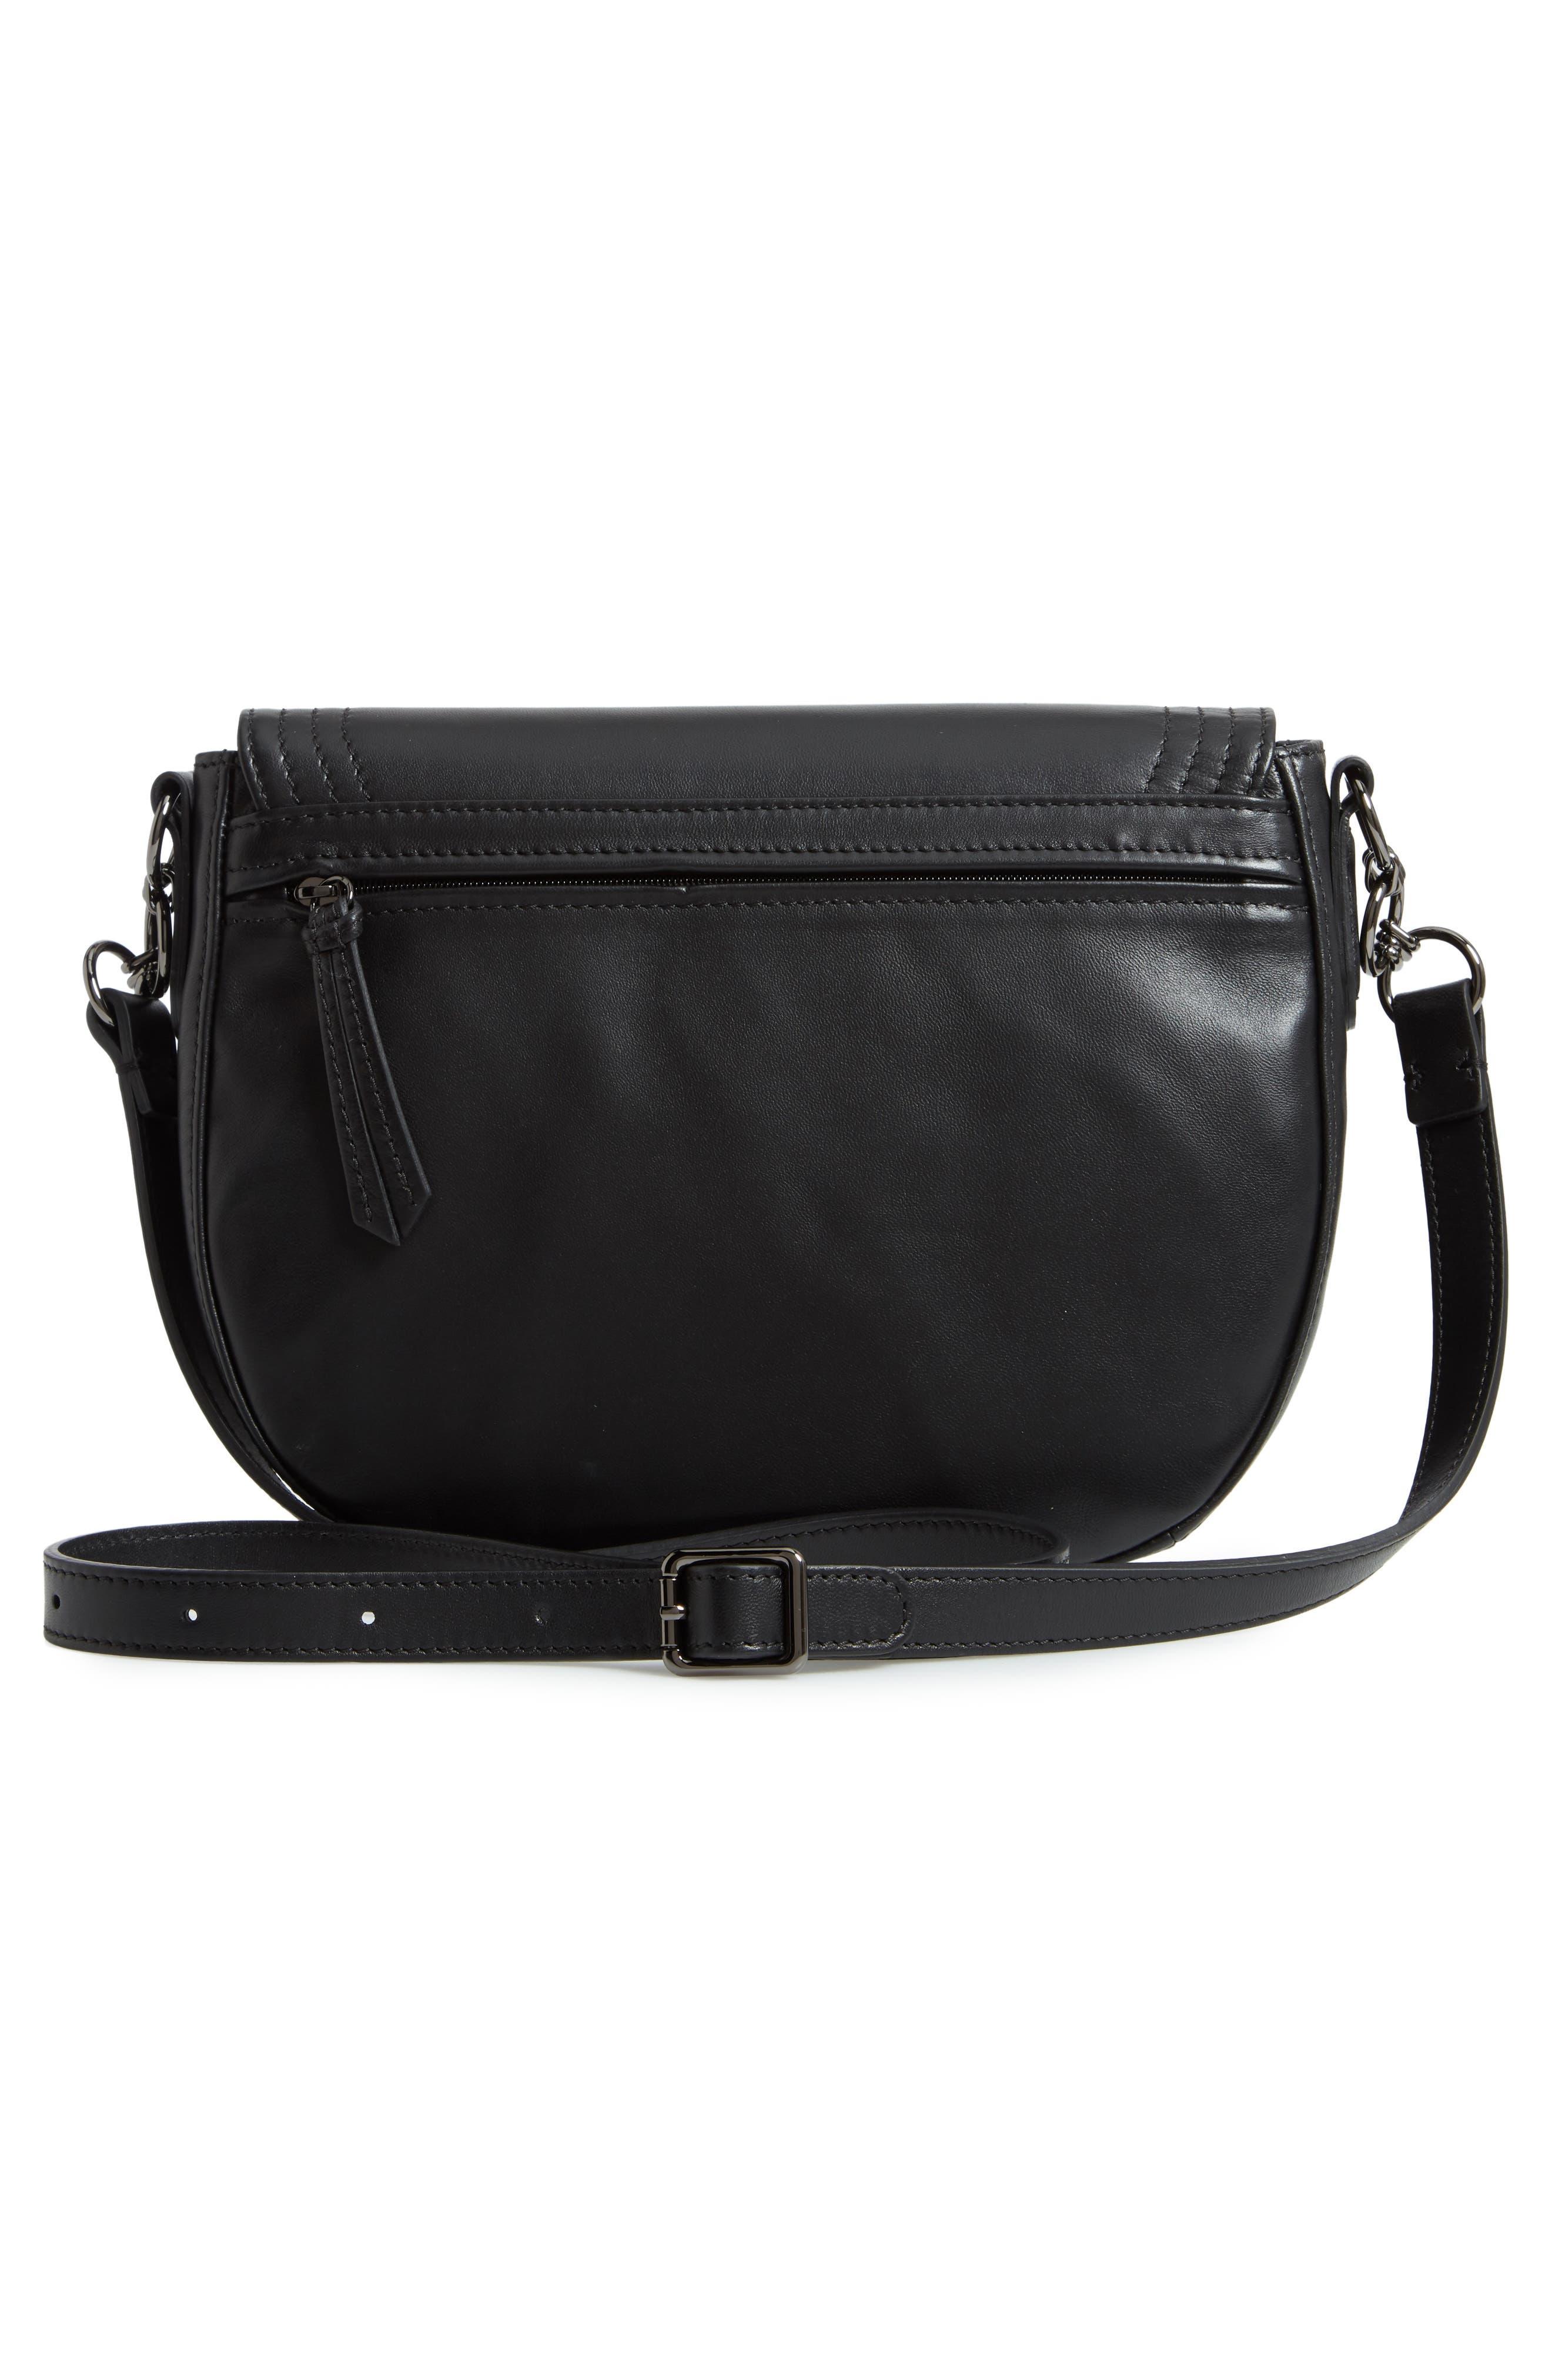 Medium Cavalcade Leather Saddle Bag,                             Alternate thumbnail 3, color,                             BLACK